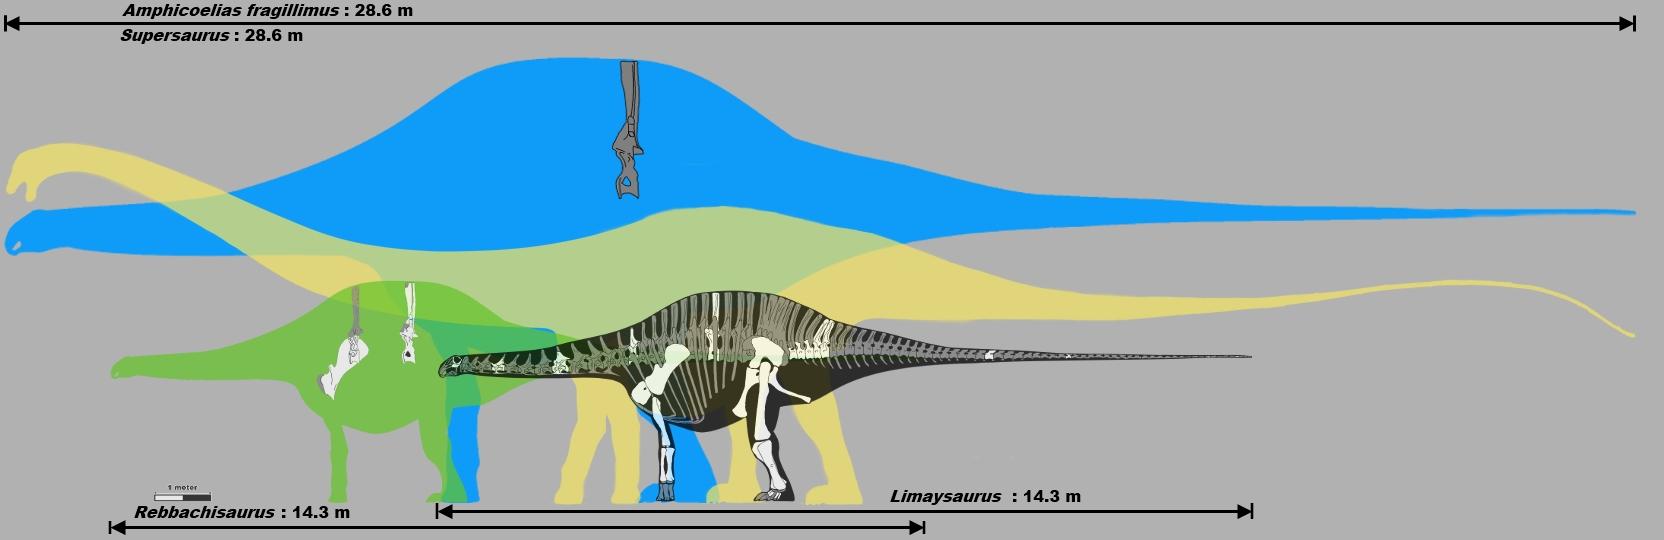 was amphicoelias a rebbachisaur by palaeozoologist on